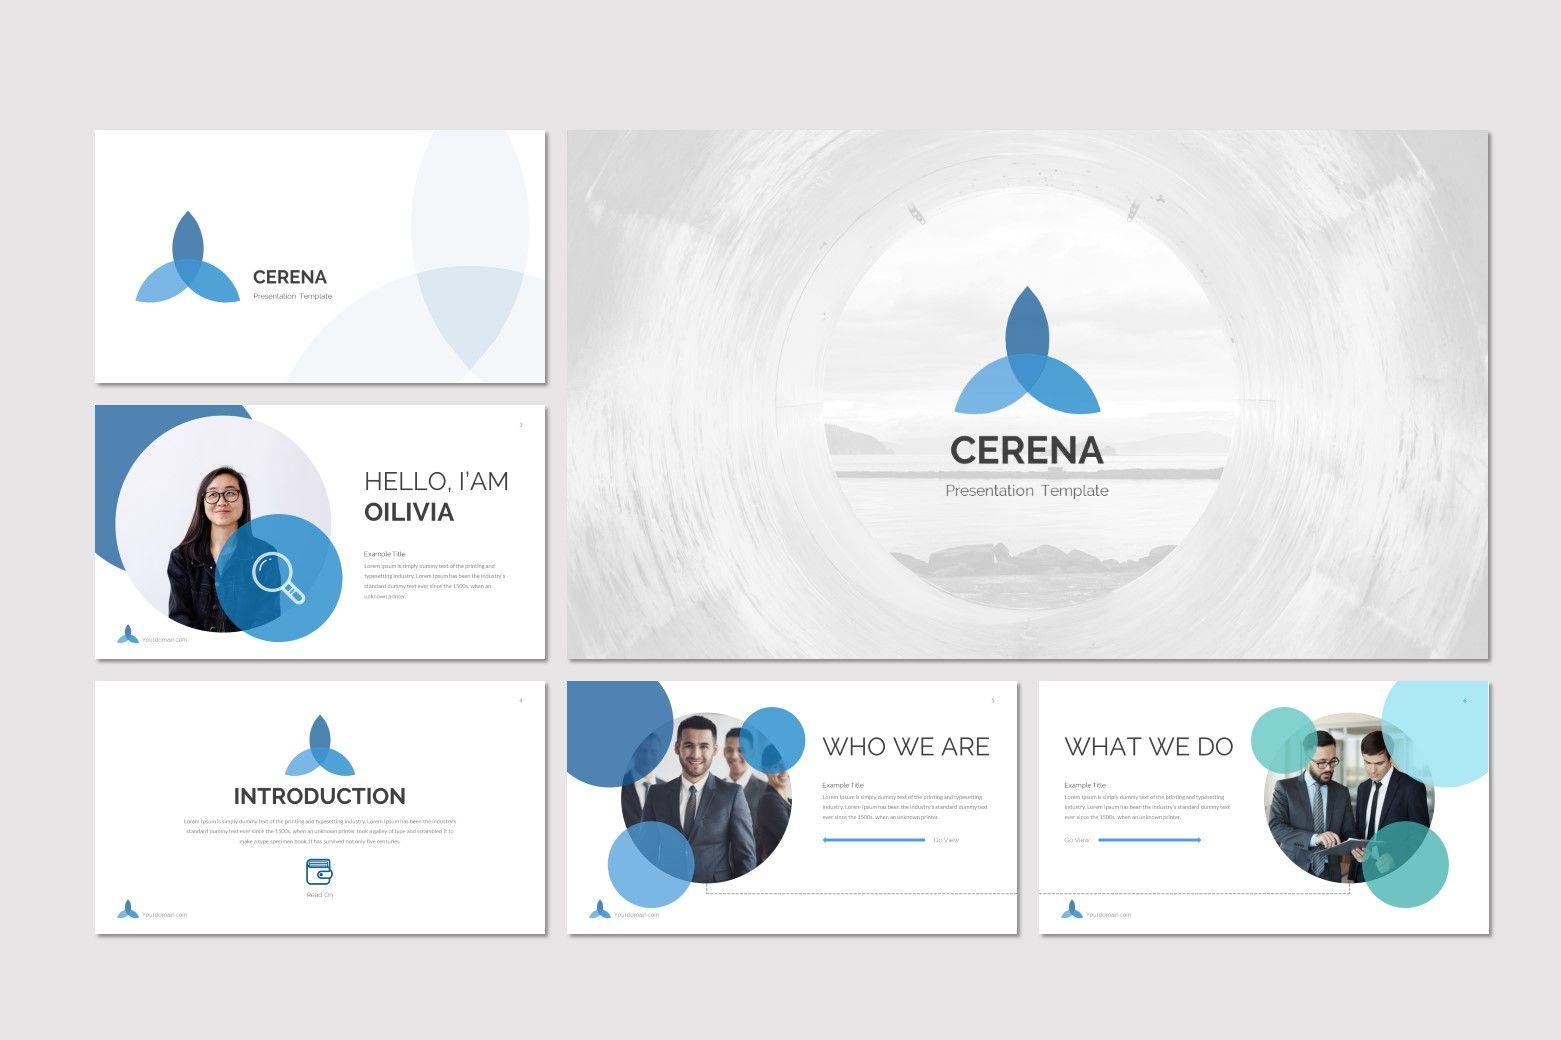 Cerena - Google Slides Template, Slide 2, 07879, Presentation Templates — PoweredTemplate.com